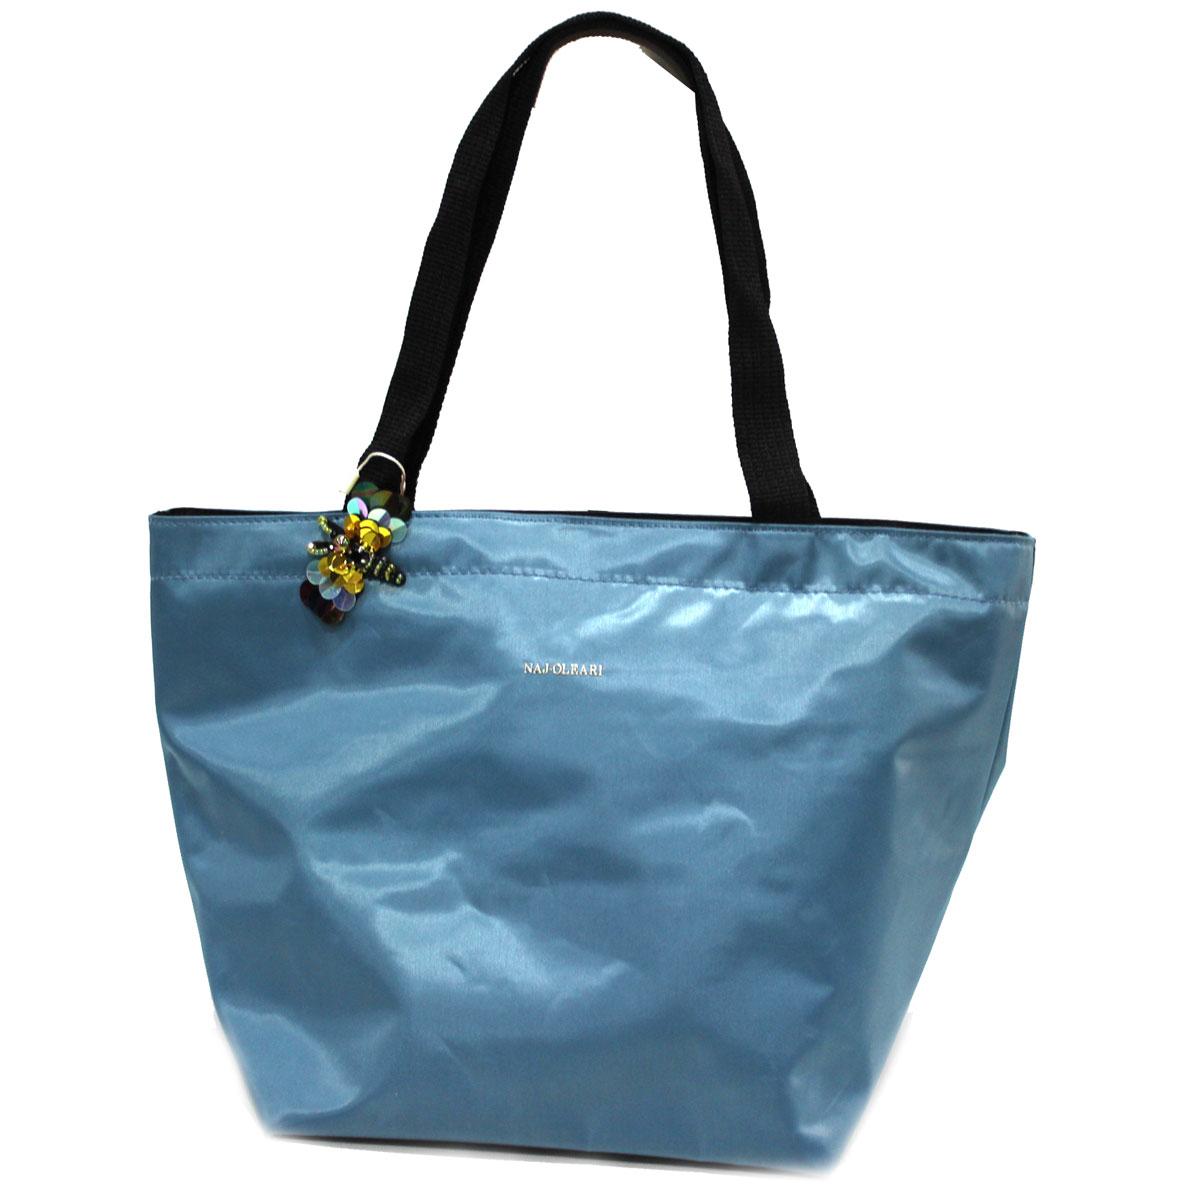 super popular abcb4 44797 Women's bag 100% nylon big shopping shoulder bag Miac line Naj Oleari 61099  blue